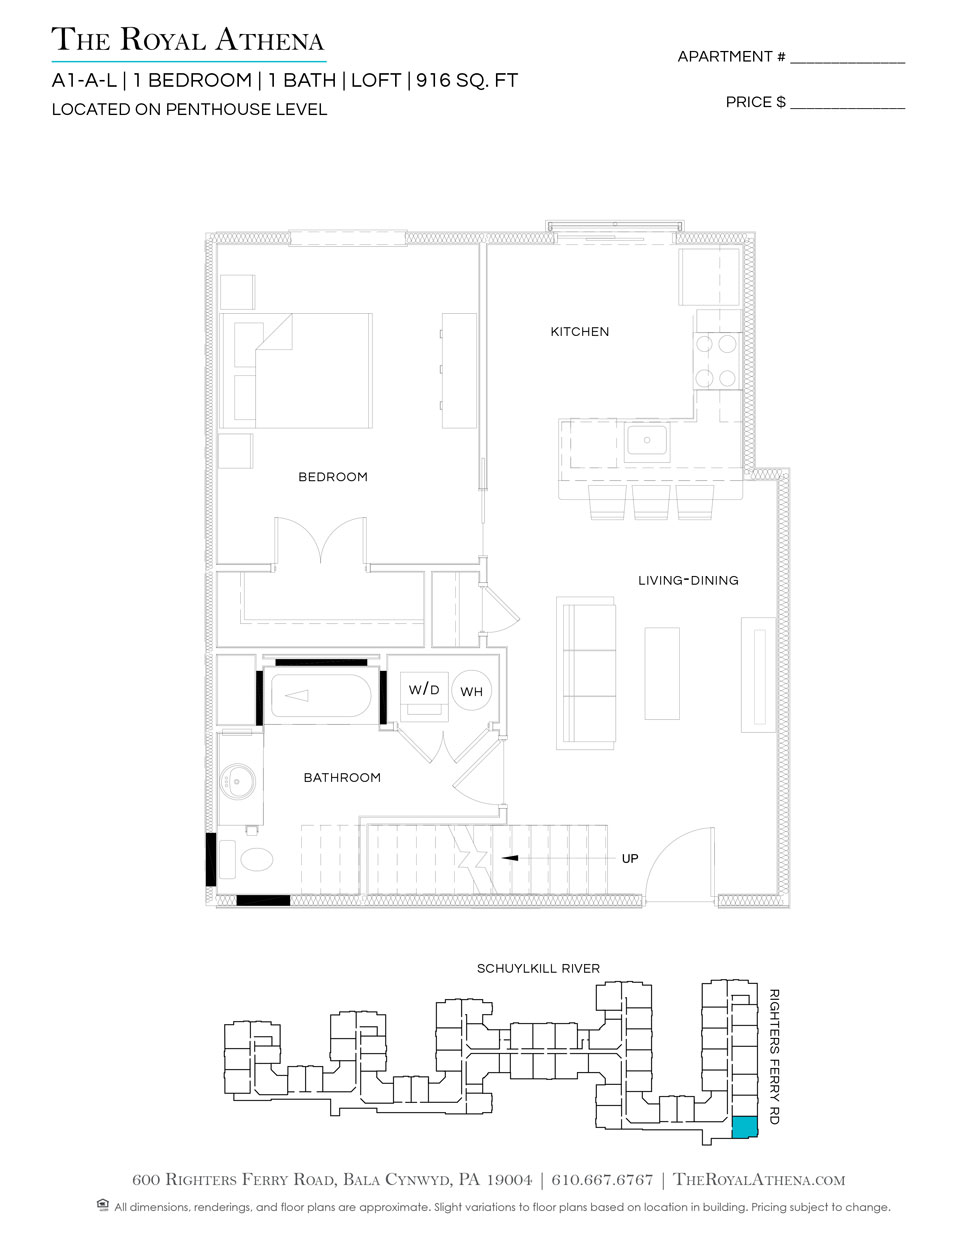 P0659218 a1 a l 1 2 floorplan